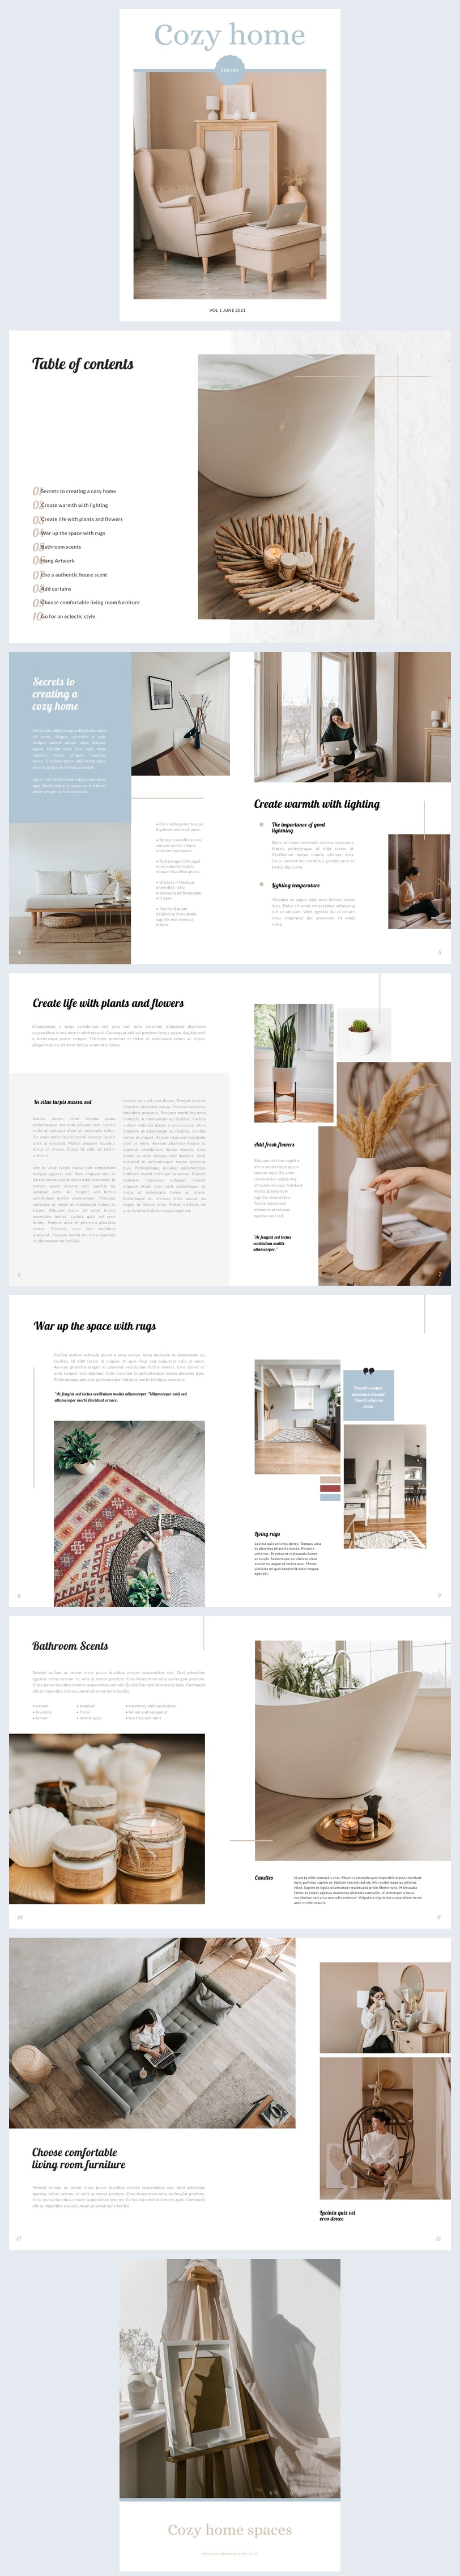 Free Home & Lifestyle Magazine Design Example